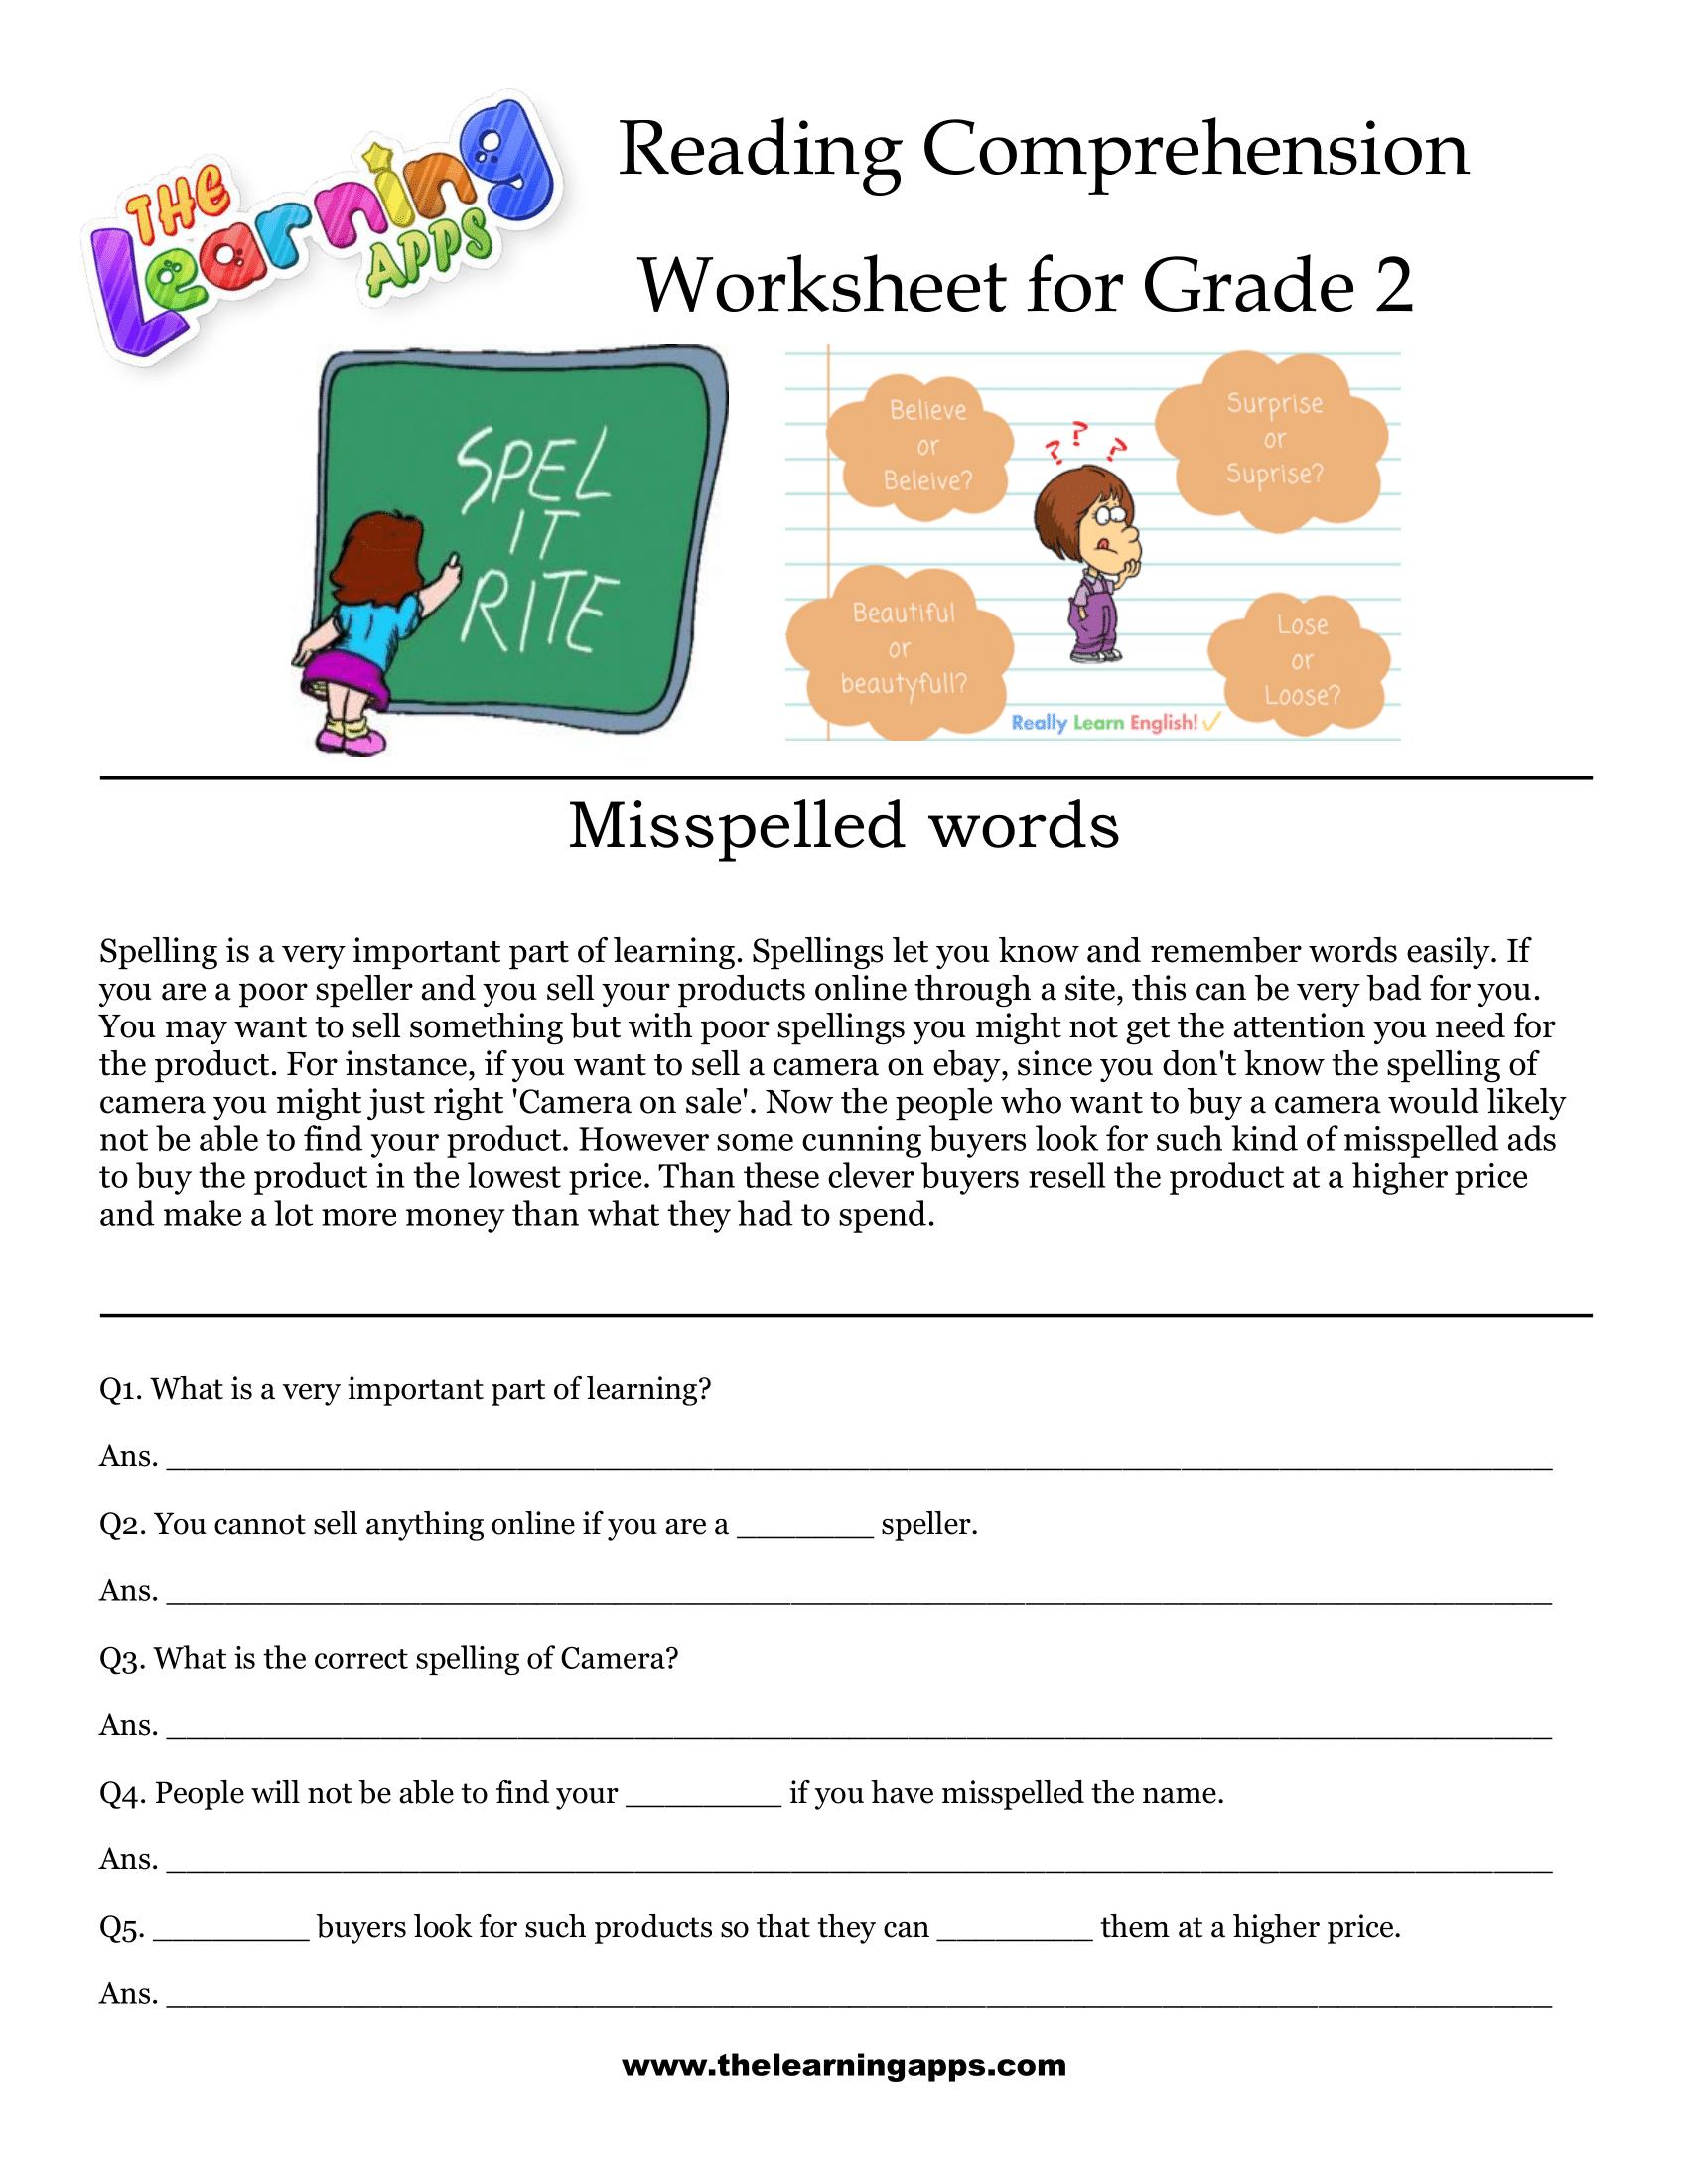 2nd Grade Reading Comprehension Printable Reading Comprehension Worksheets Free Reading Comprehension Worksheets Comprehension Worksheets [ 2200 x 1700 Pixel ]